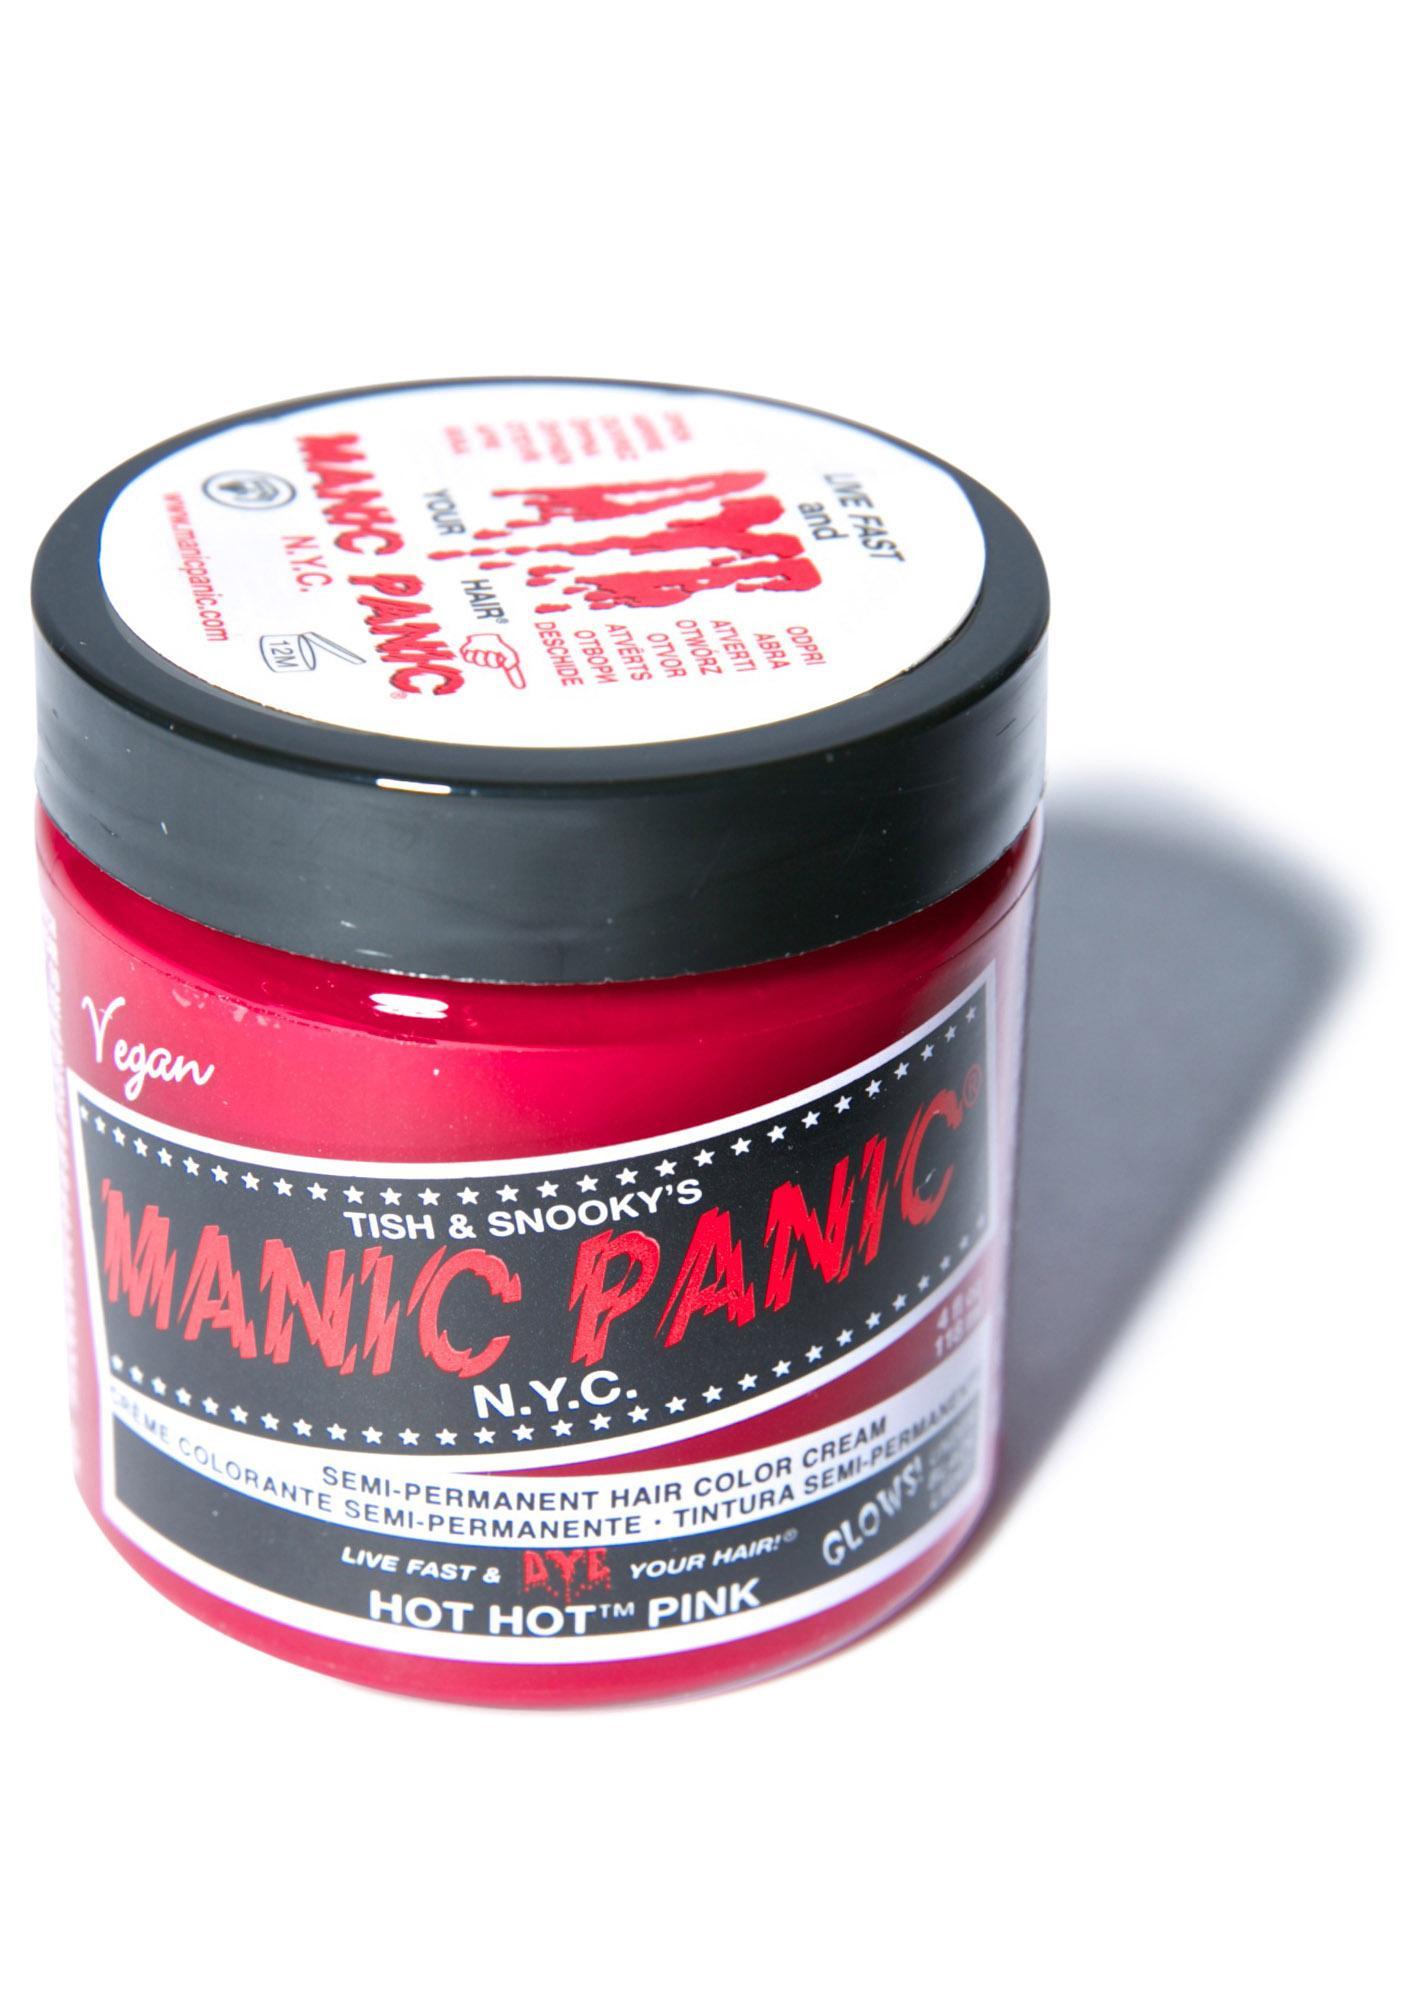 Manic Panic Hot Hot Pink Classic Hair Dye